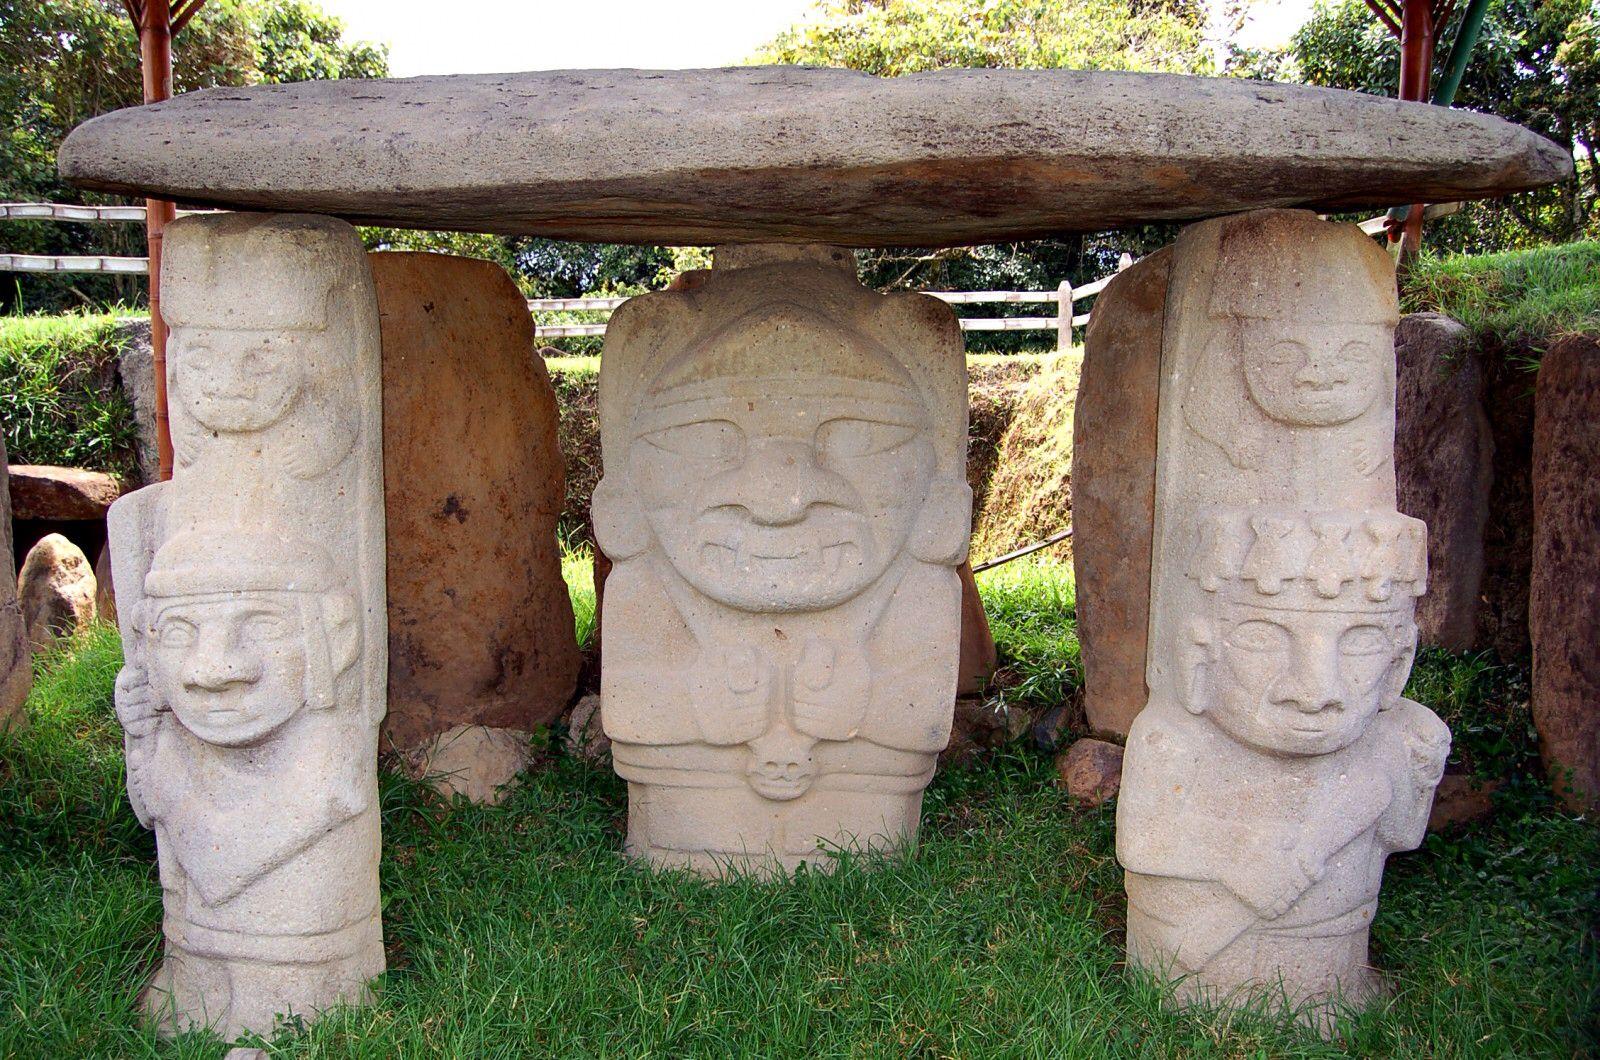 Parques arqueológicos. Foto: Amparo Nakagawa, co.pinterest.com/